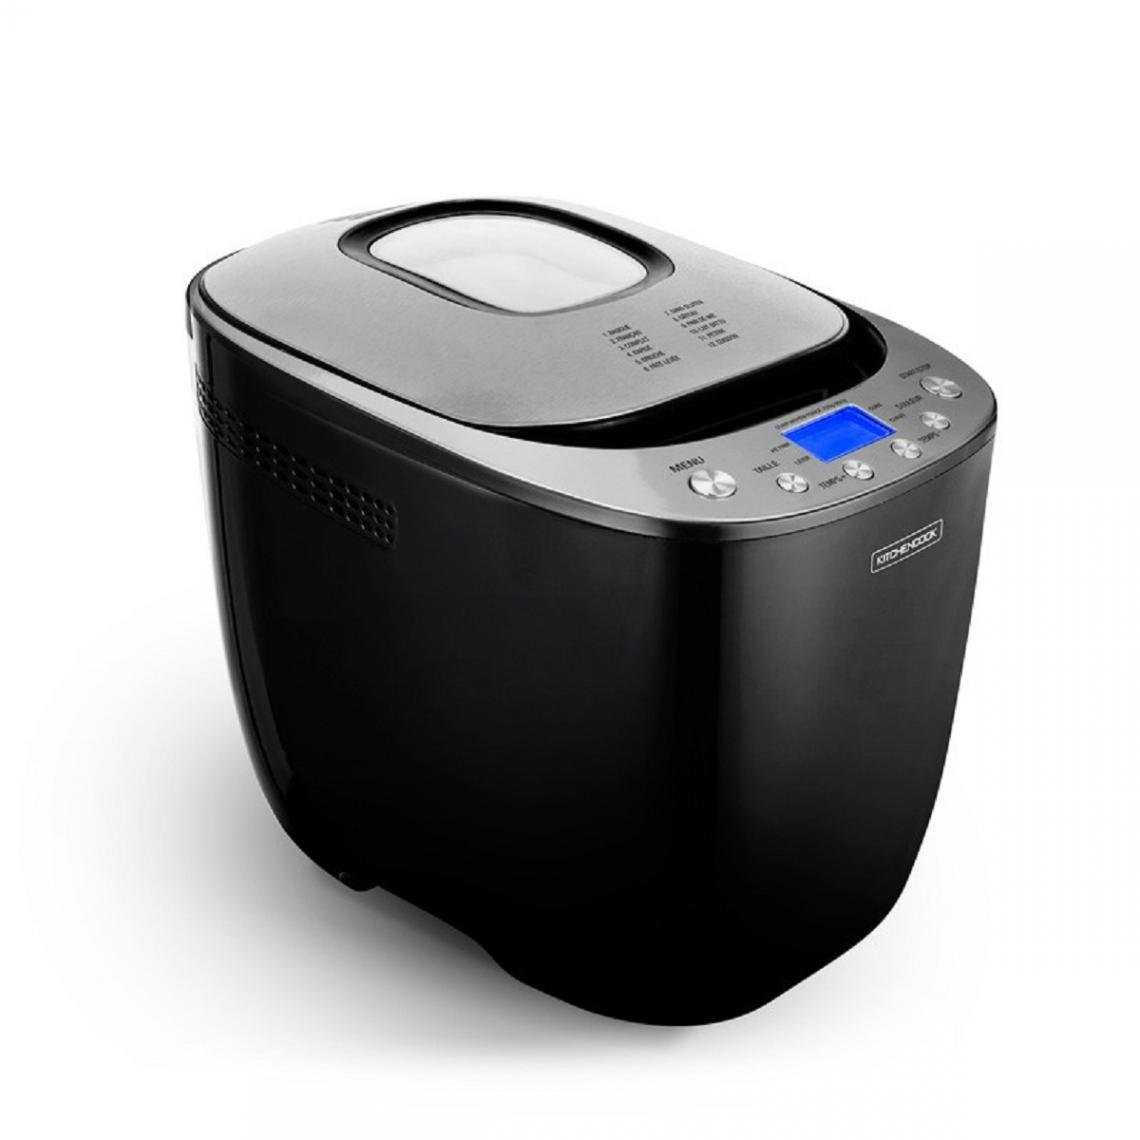 Kitchencook Machine à pain Smart-B - 12 programmes - 900g - Noir